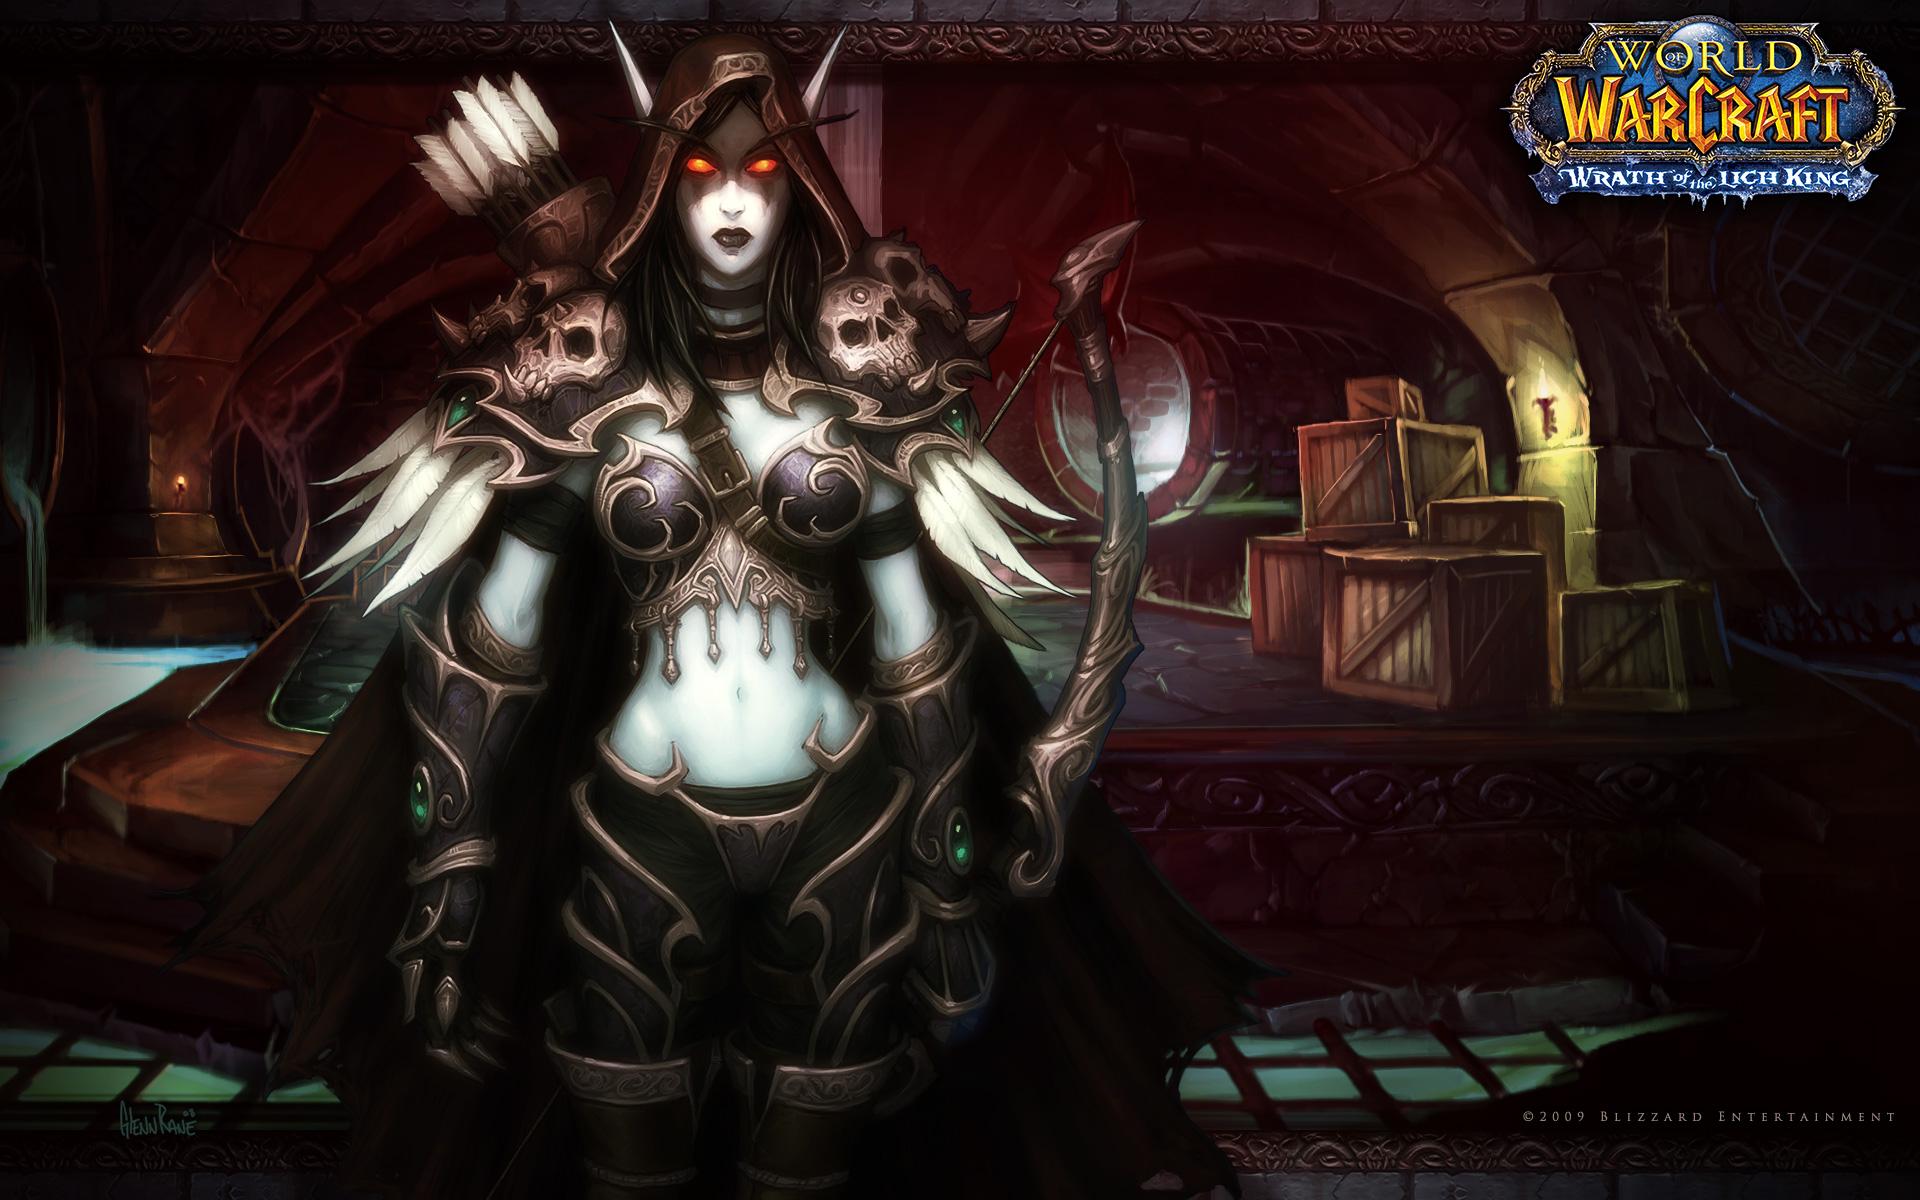 World of Warcraft wallpaper 14